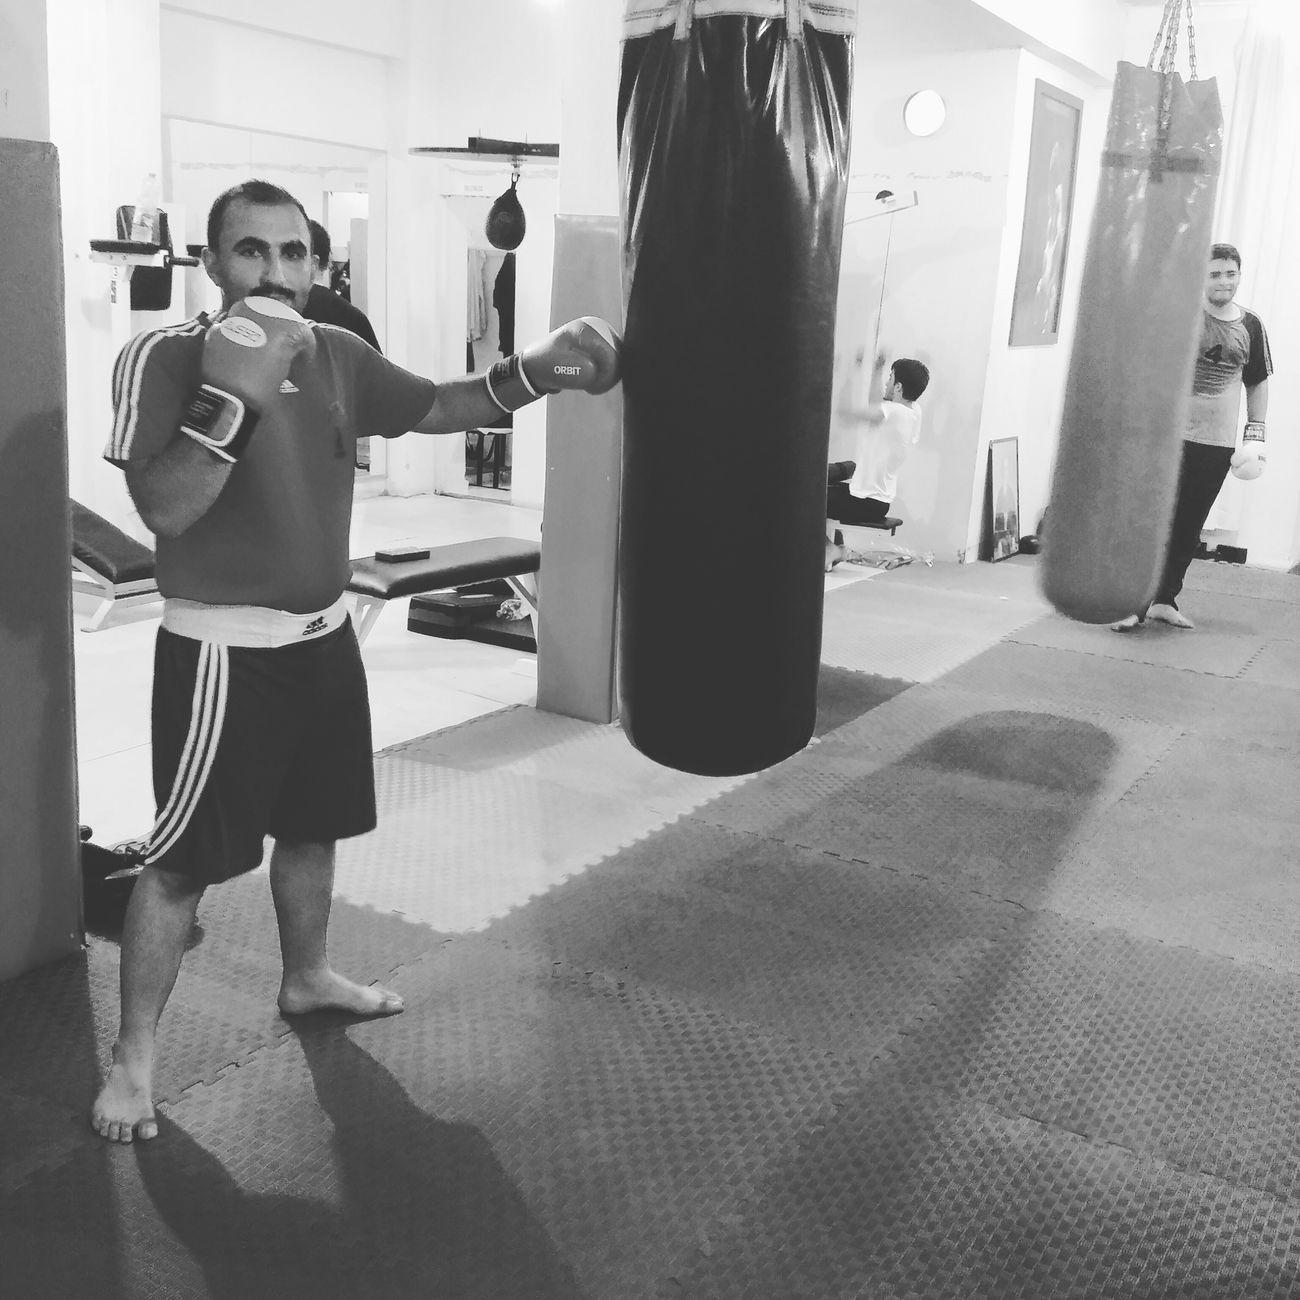 şampiyonsporokulu Boks Boxing Traning Sportclub Izmirlife Turkey Izmir